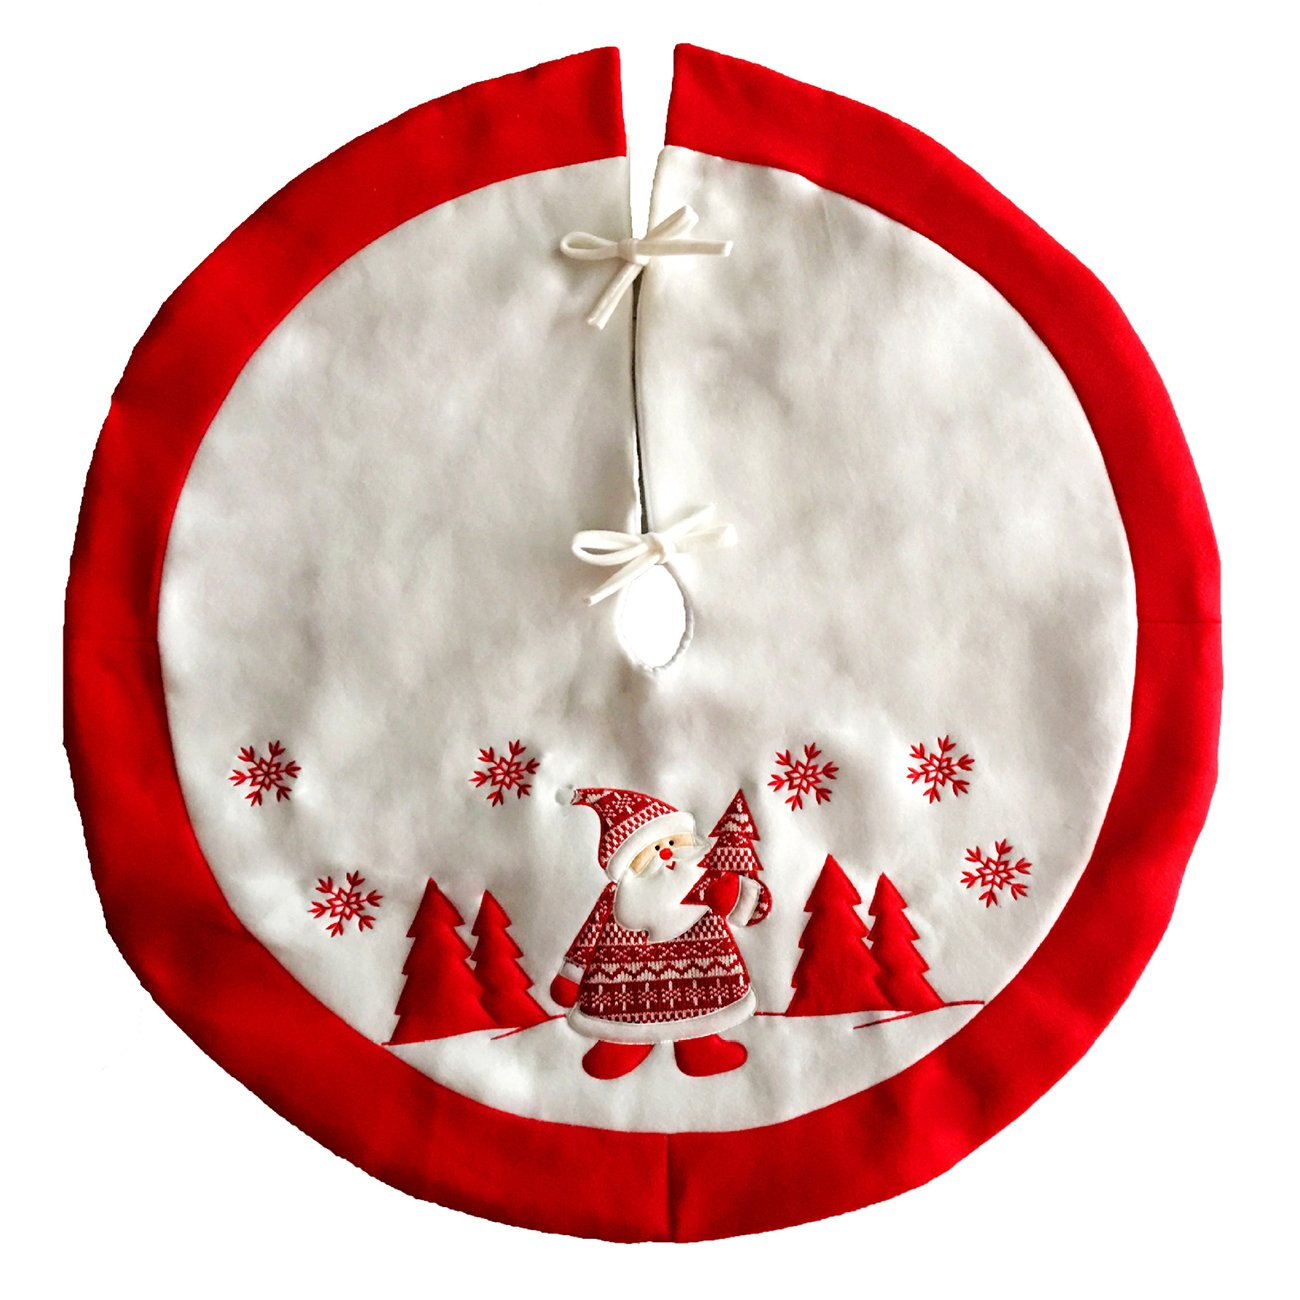 UHeng 35'' Christmas Tree Plush Skirt Ornaments Snowman Santa Reindeer Decoration